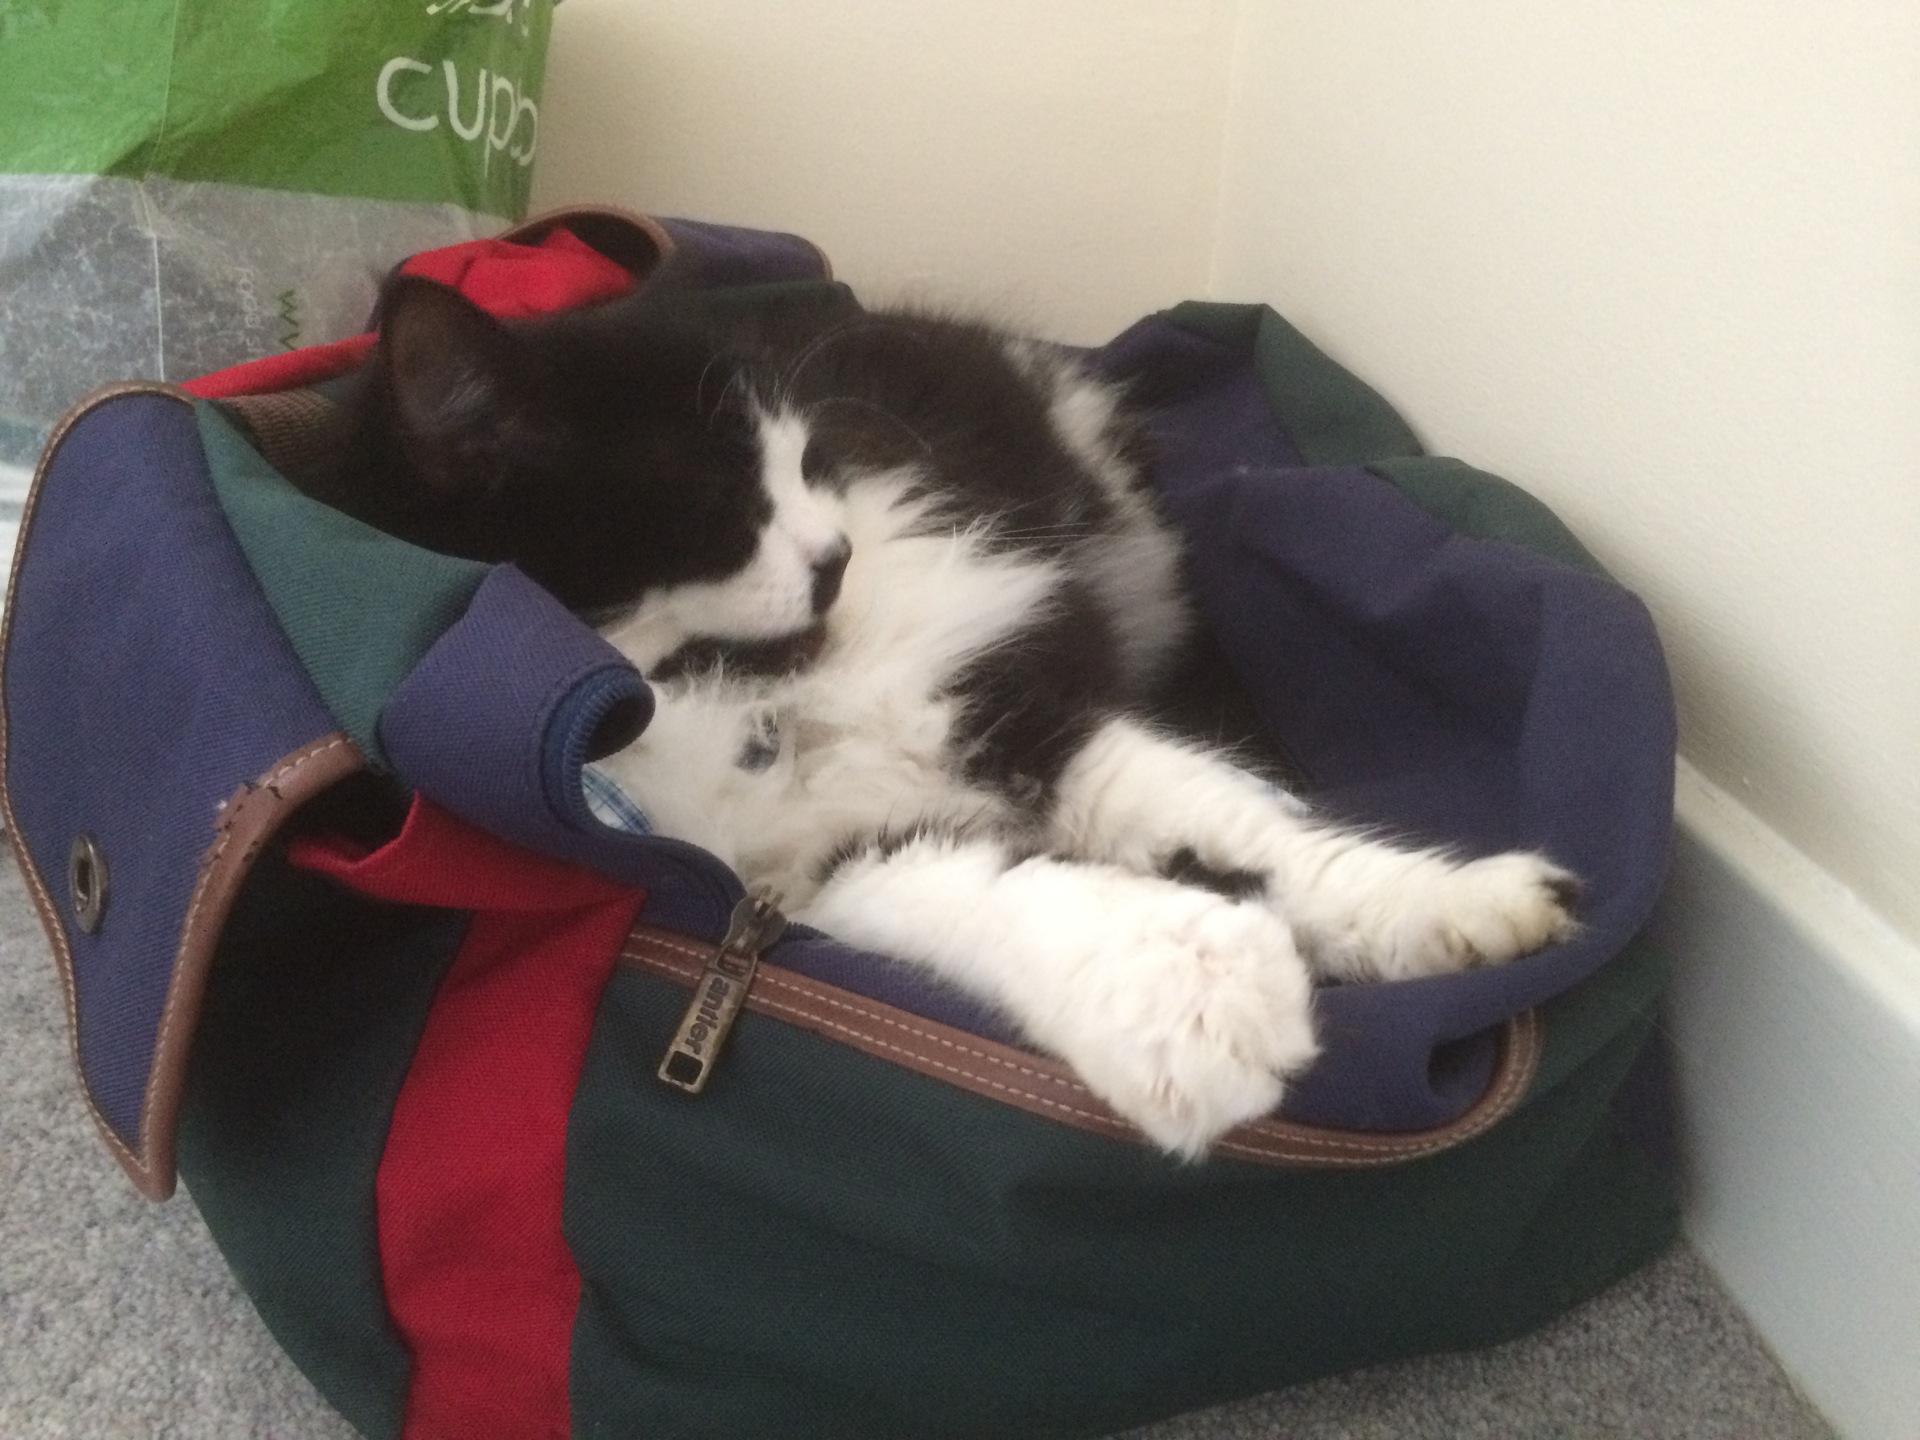 Mittens makes himself comfortable – Feb 2016